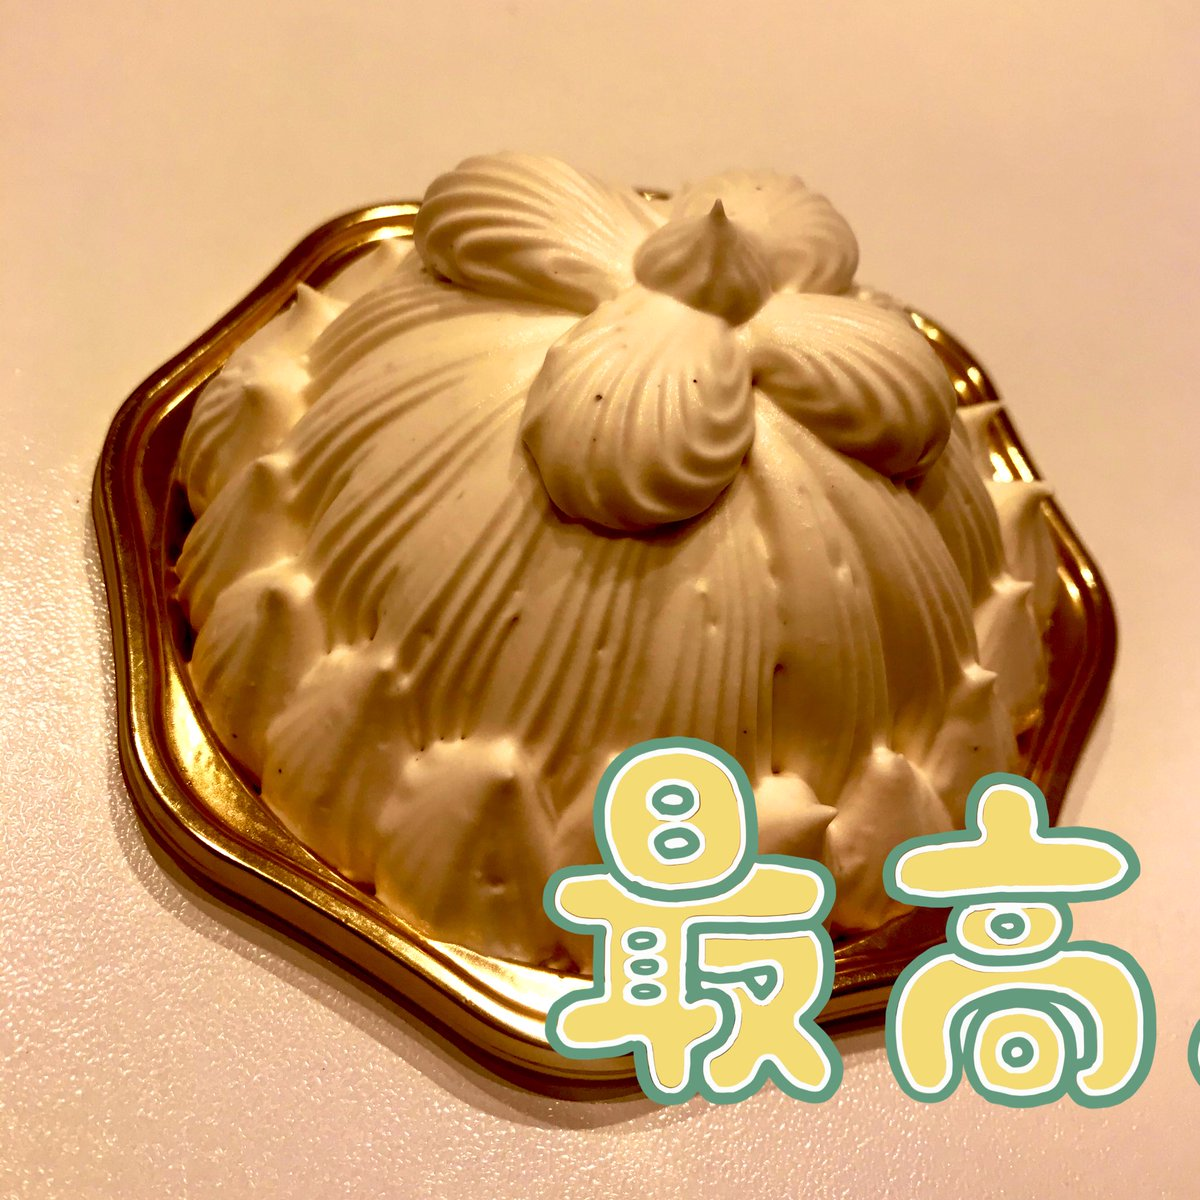 test ツイッターメディア - 先輩の誕生日だったので、マロンシャンテリー✨ 美味しかったー✨  写真は、アールグレイバージョンです(^^)  #東京會舘 #マロンシャンテリー https://t.co/XHvMTHy8NQ